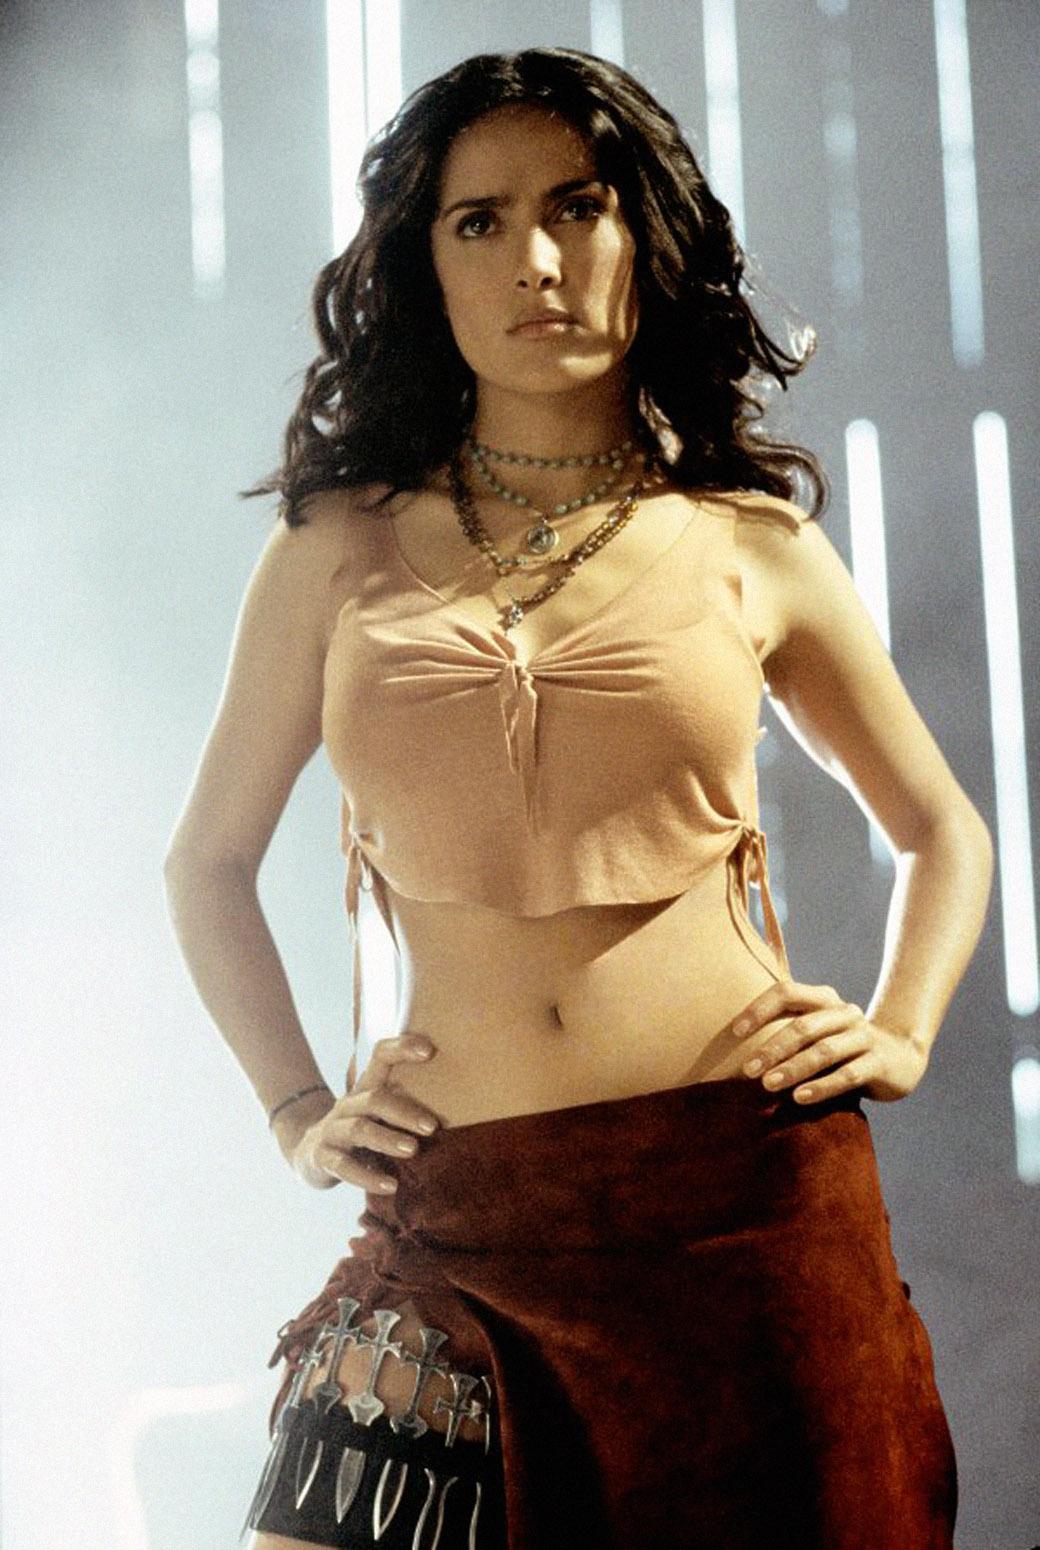 Salma hayek young nude pics big pussy jada